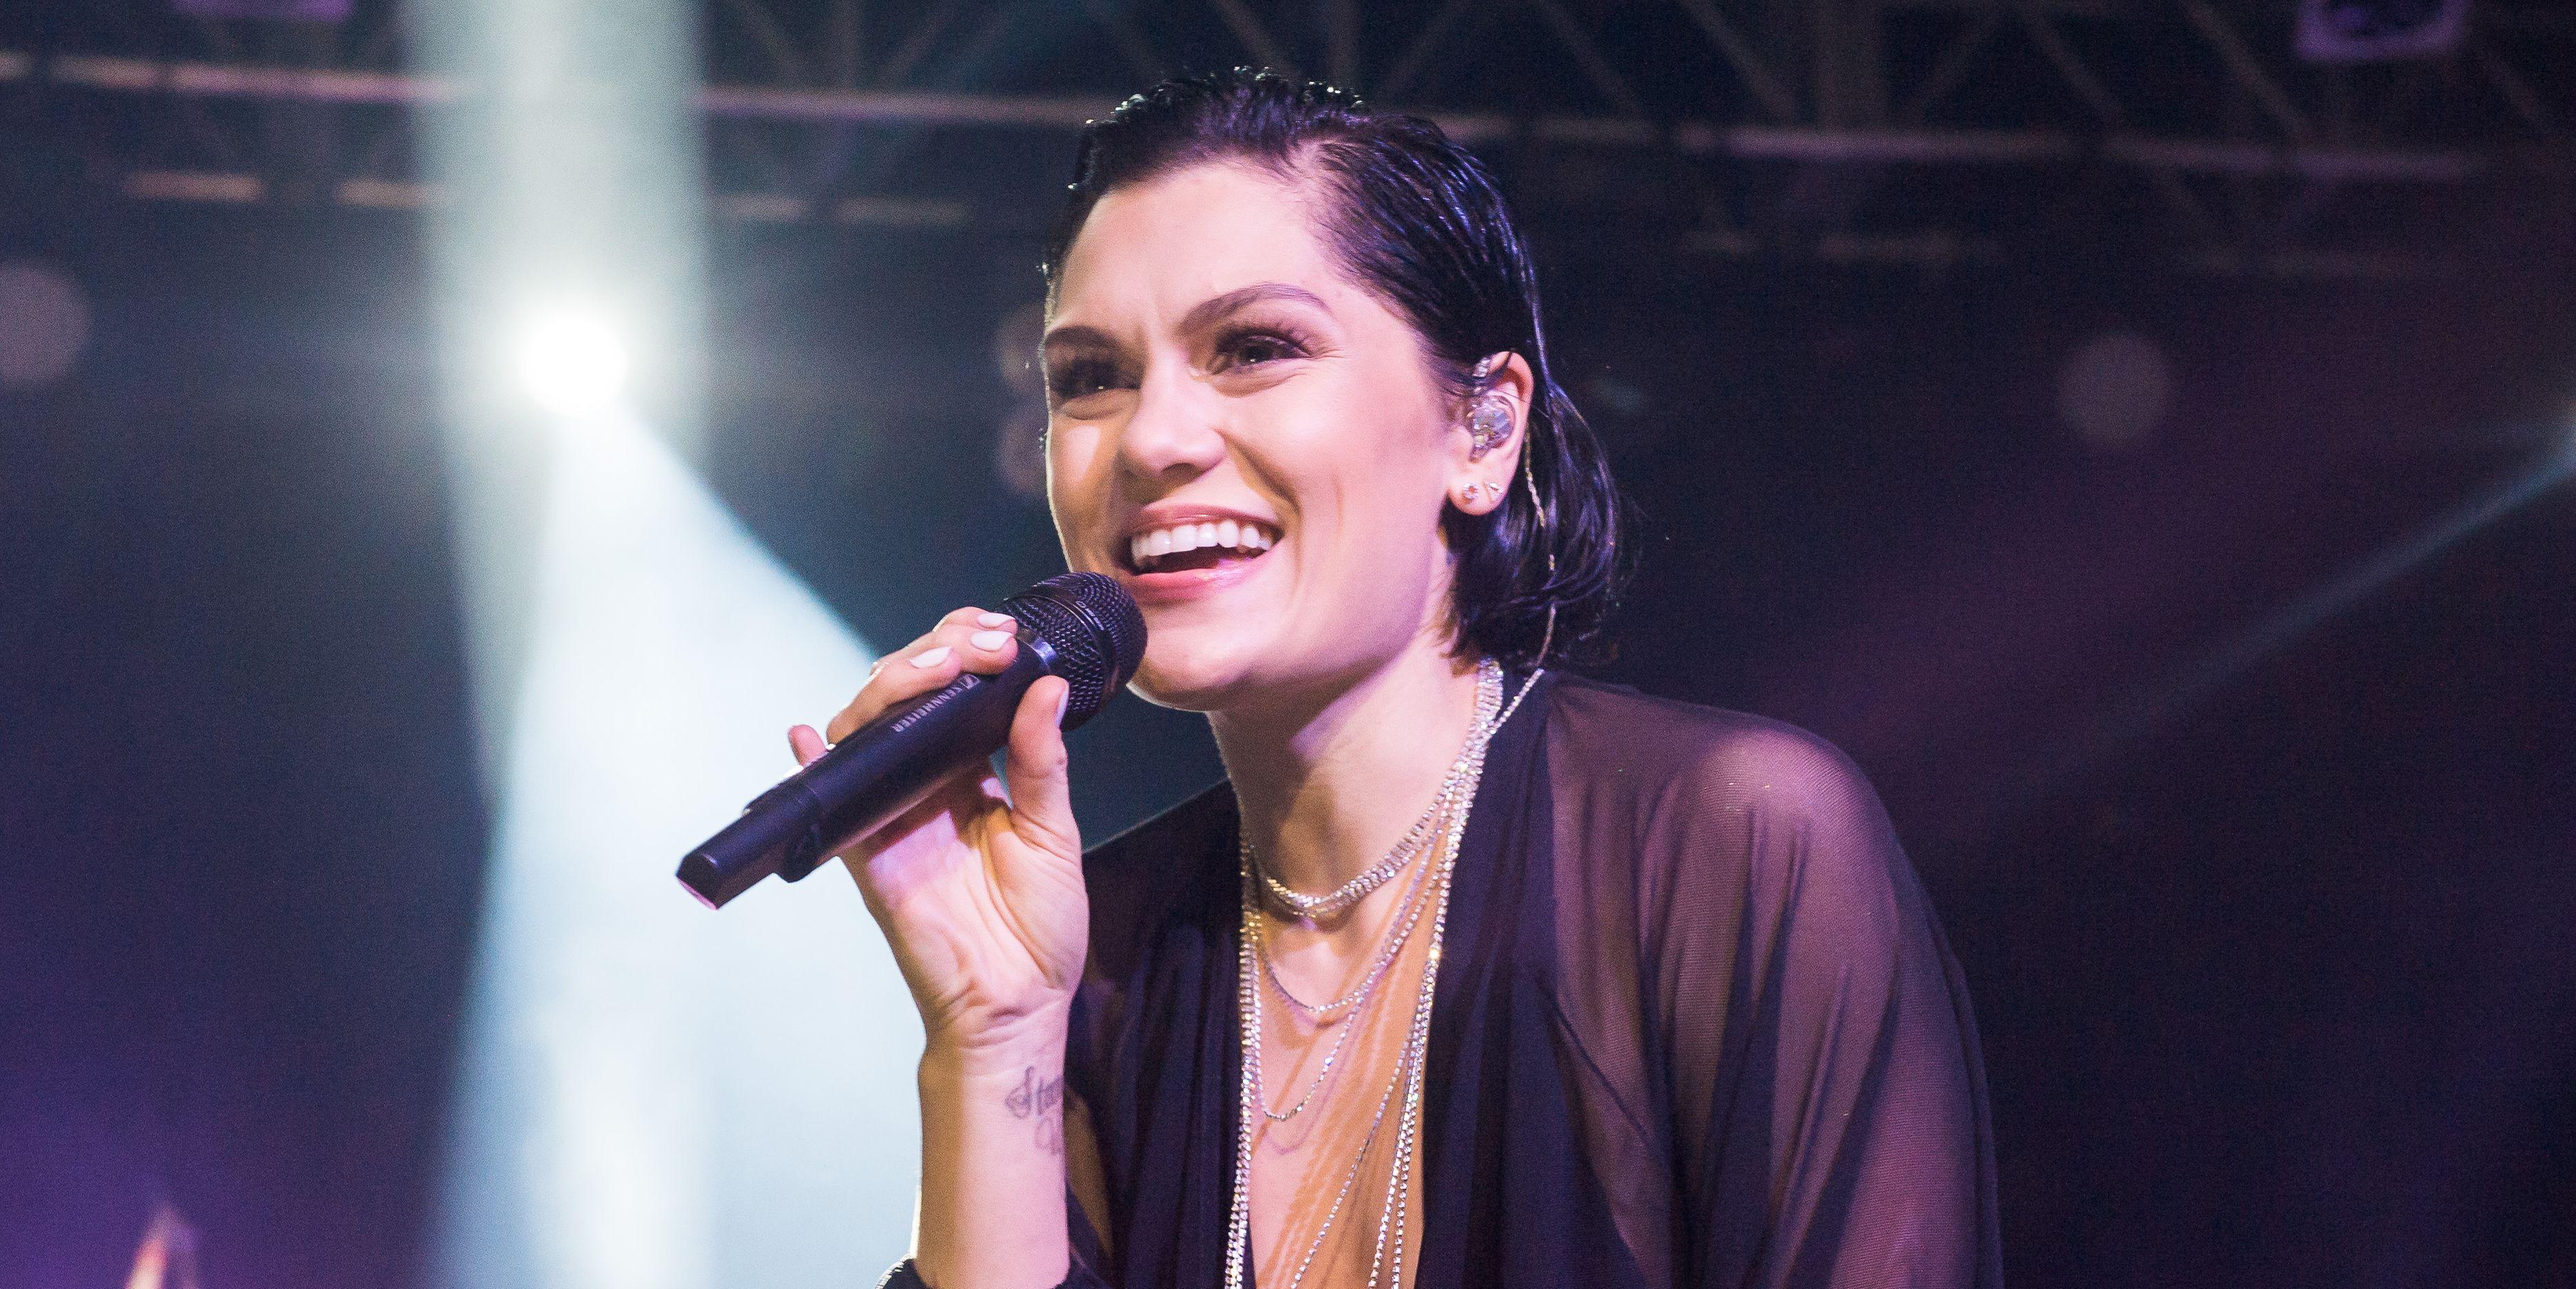 Jessie J Performing at KOKO